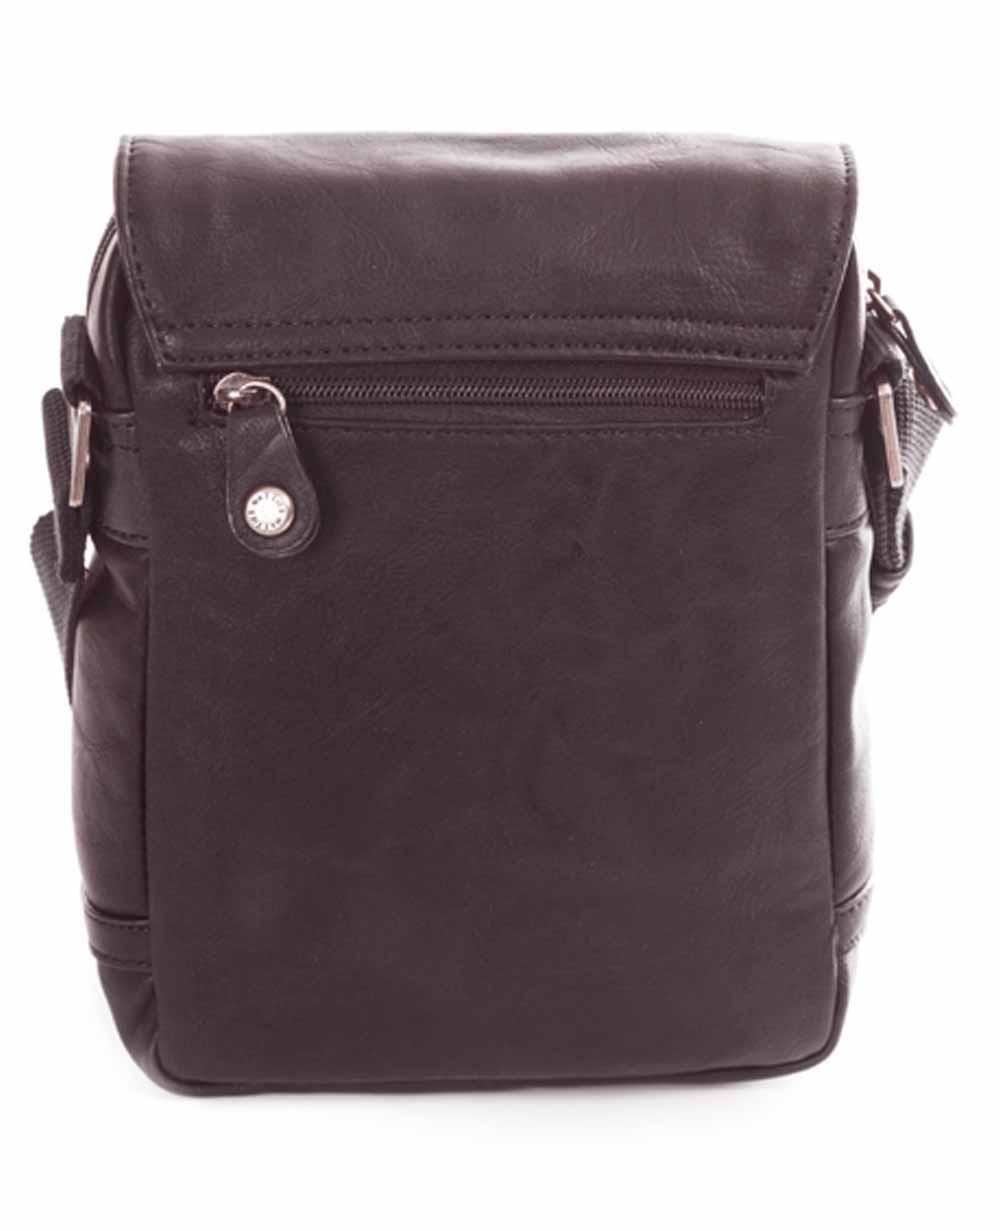 Matties Bags Bandolera Bags Marrón Bandolera Matties YI6yfbgv7